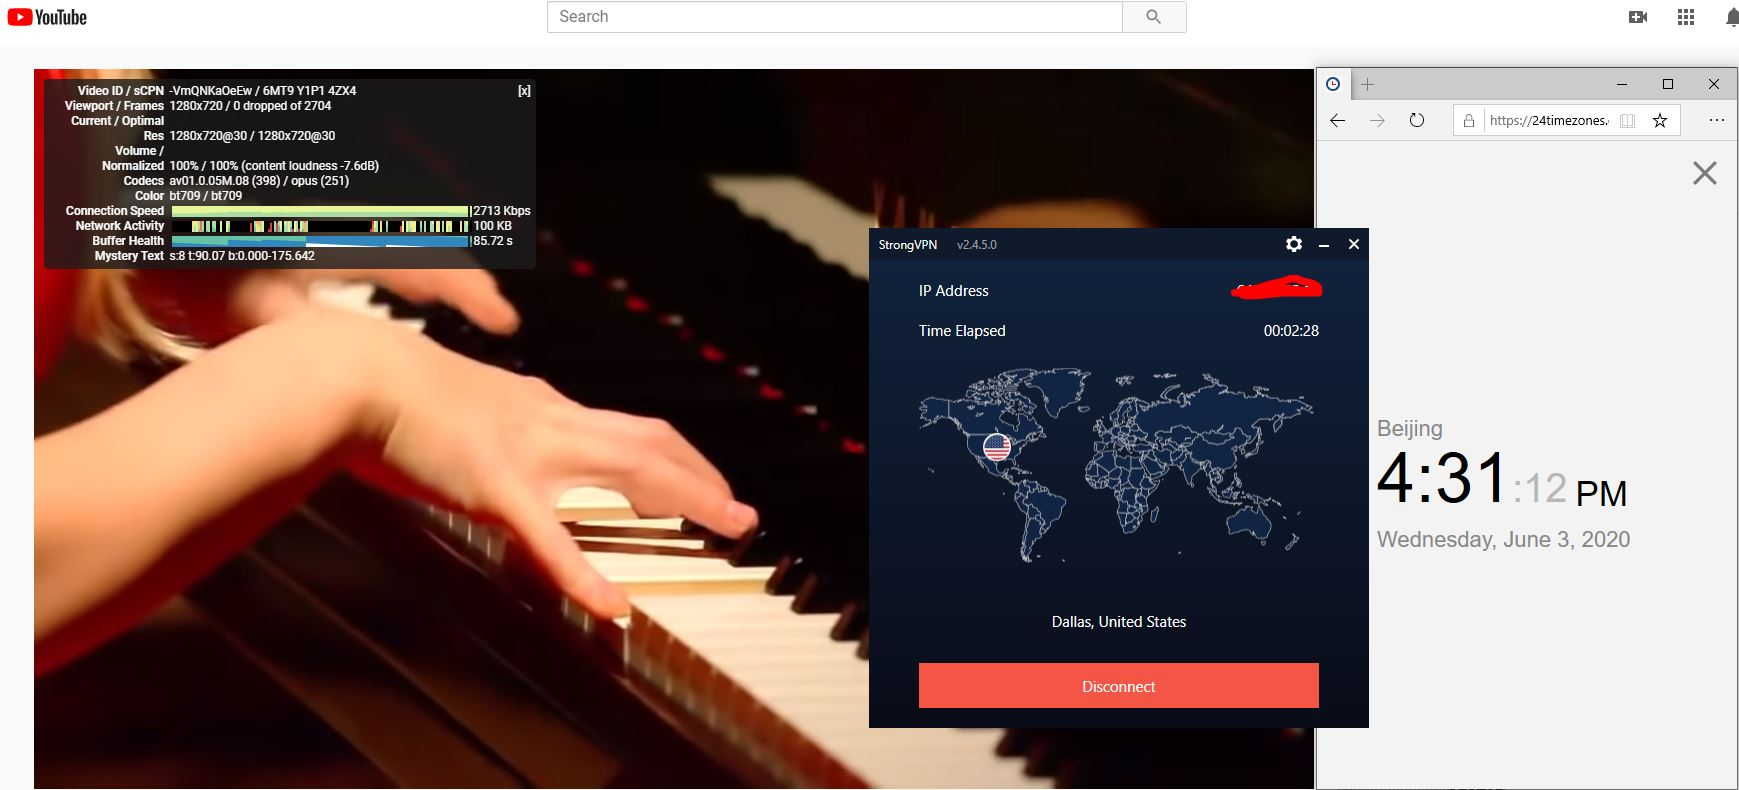 Windows10 StrongVPN IKEv2协议 USA - Dallas 中国VPN 翻墙 科学上网 测速-20200603